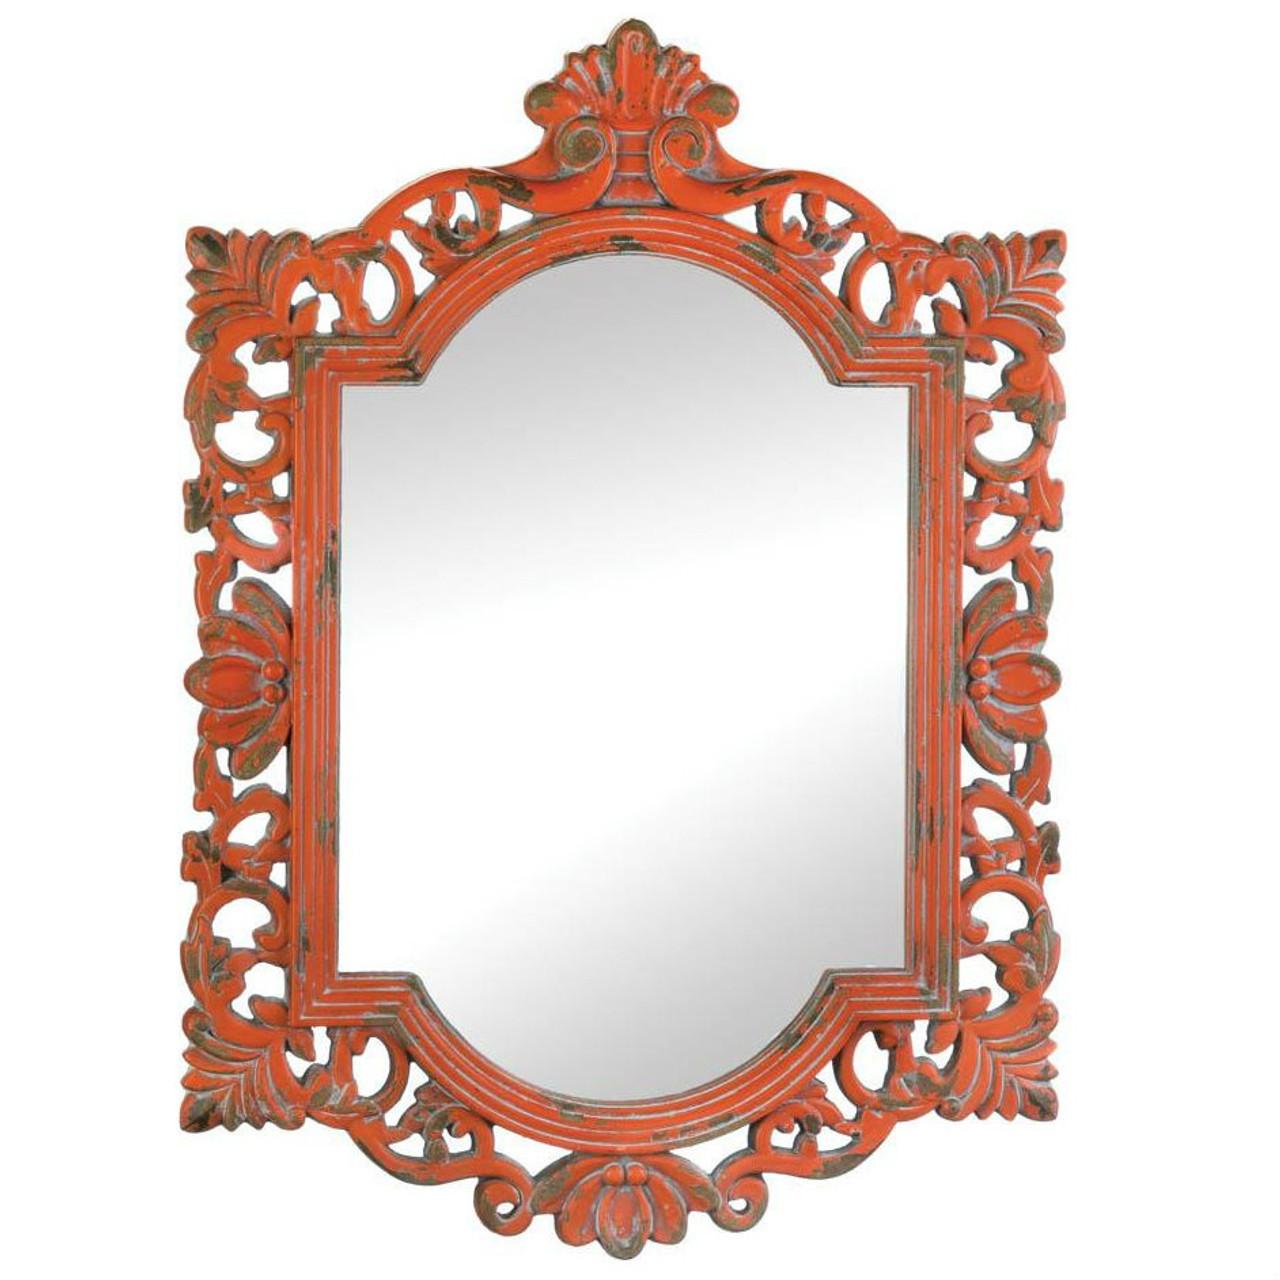 Vintage-Look Ornate Wood Frame Mirror - AEWholesale